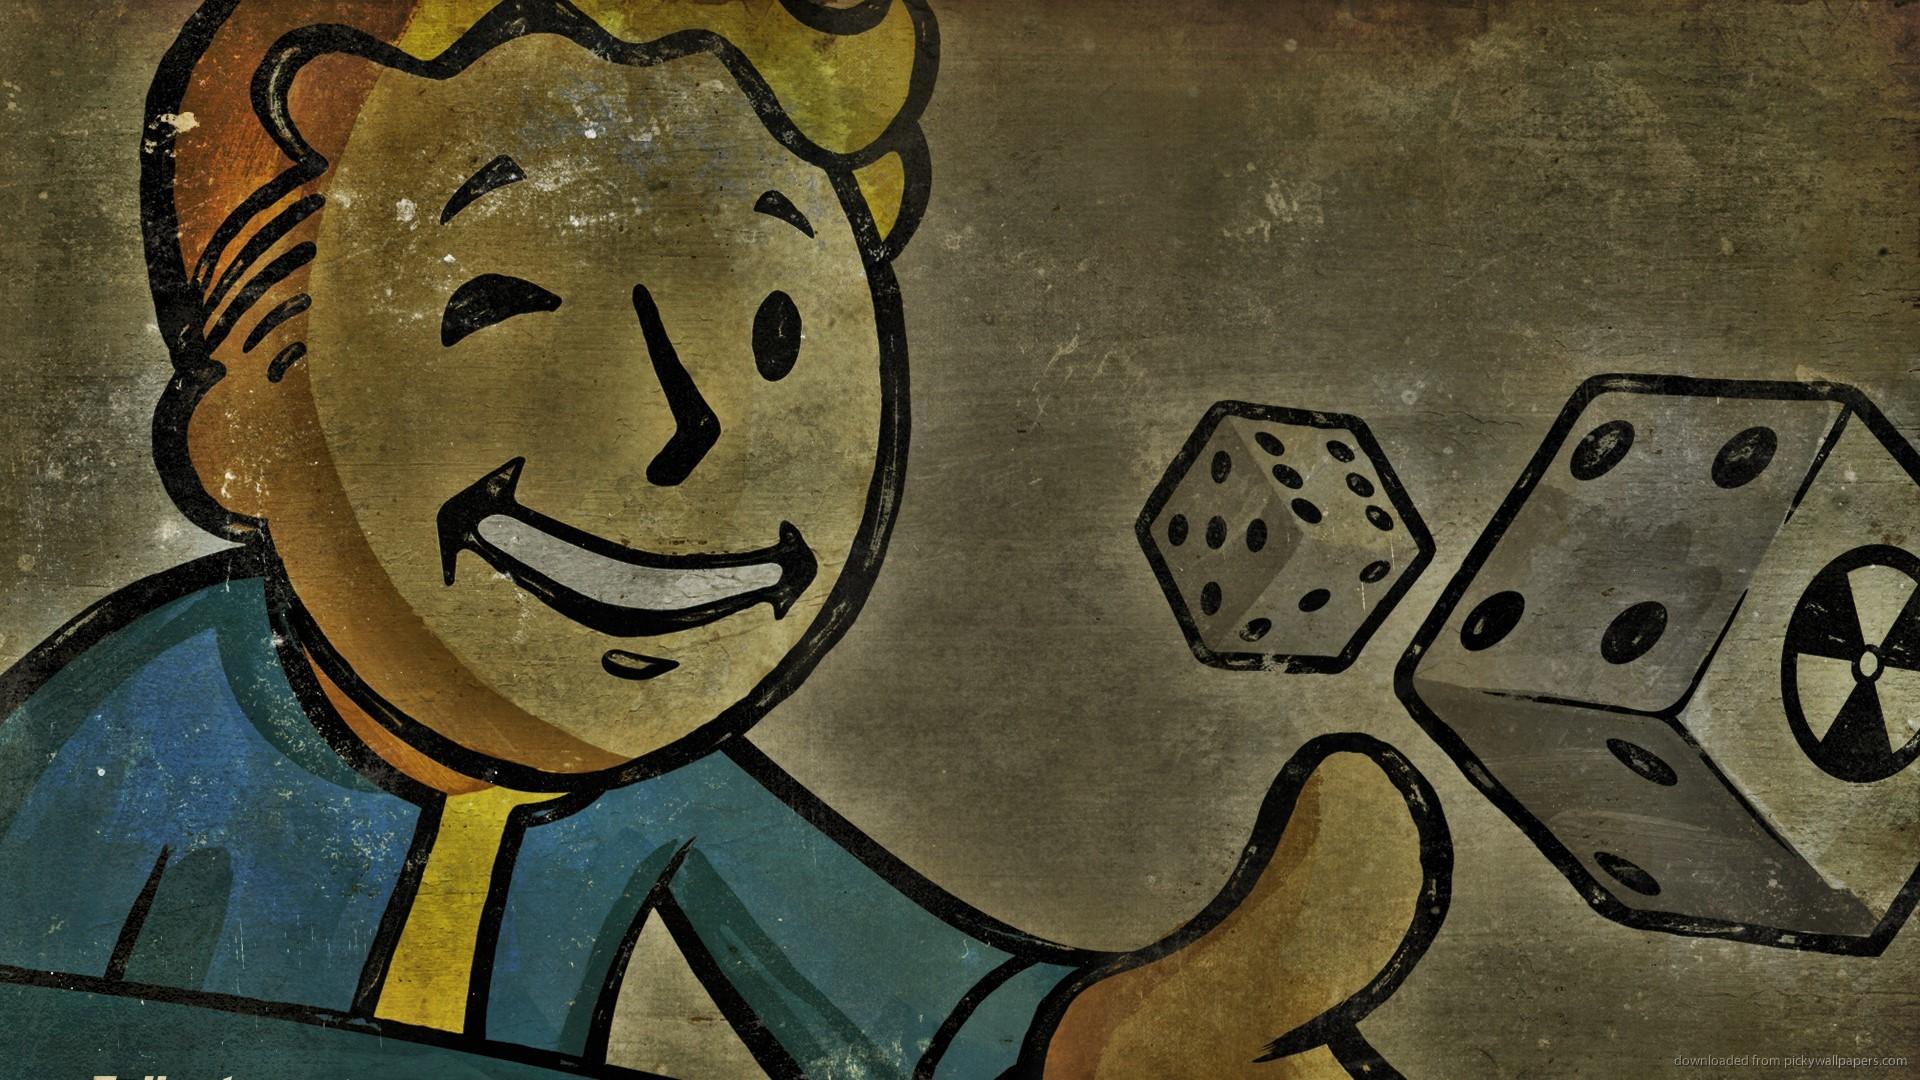 … Fallout Vaultboy Gambling – Edit by RPG247